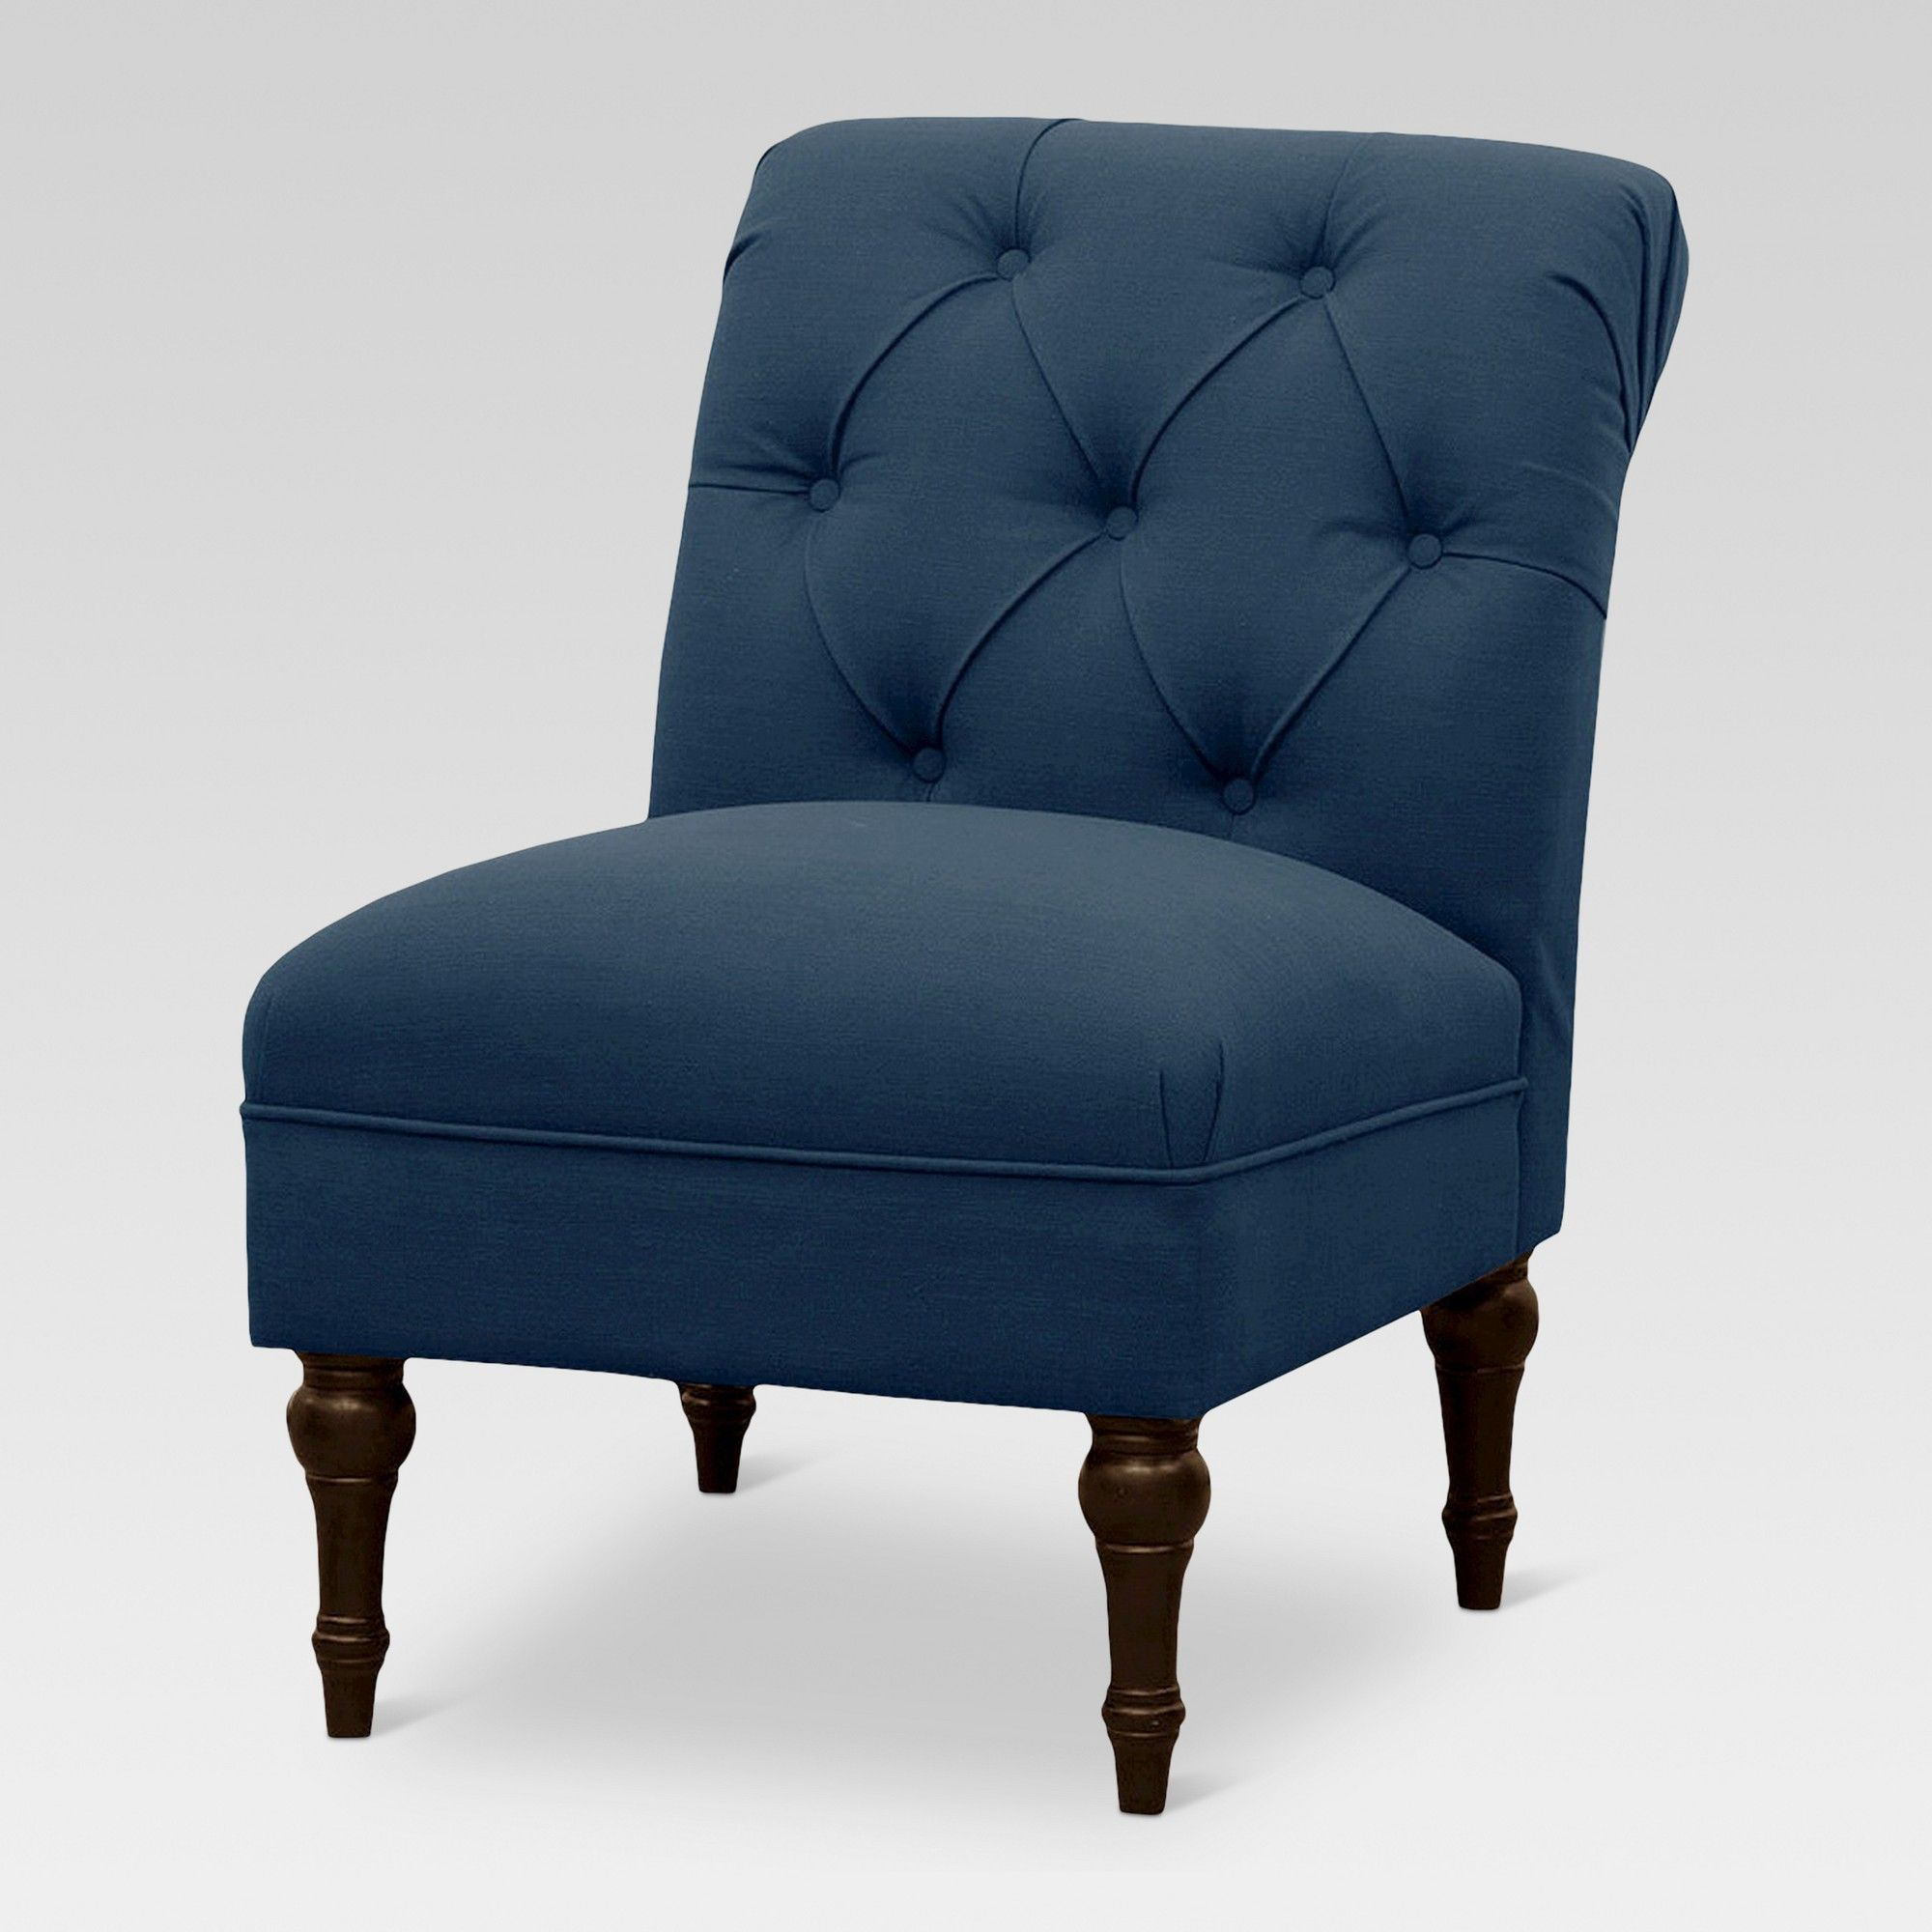 Best Tufted Rollback Slipper Chair Denim Navy Threshold 400 x 300